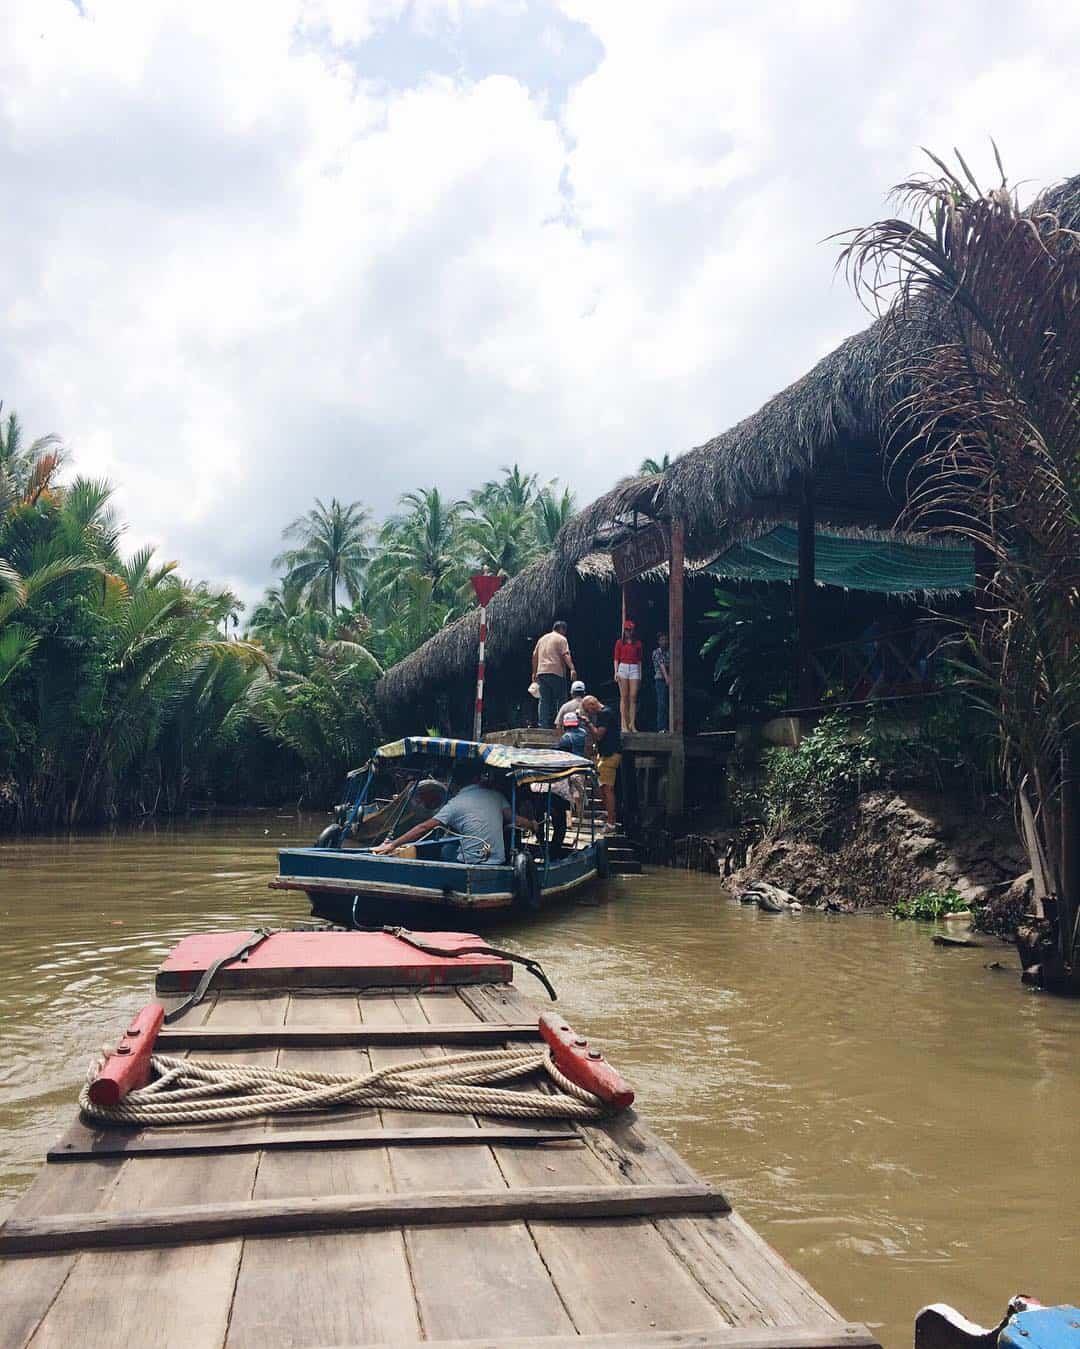 Boat ride in Tan Phong island